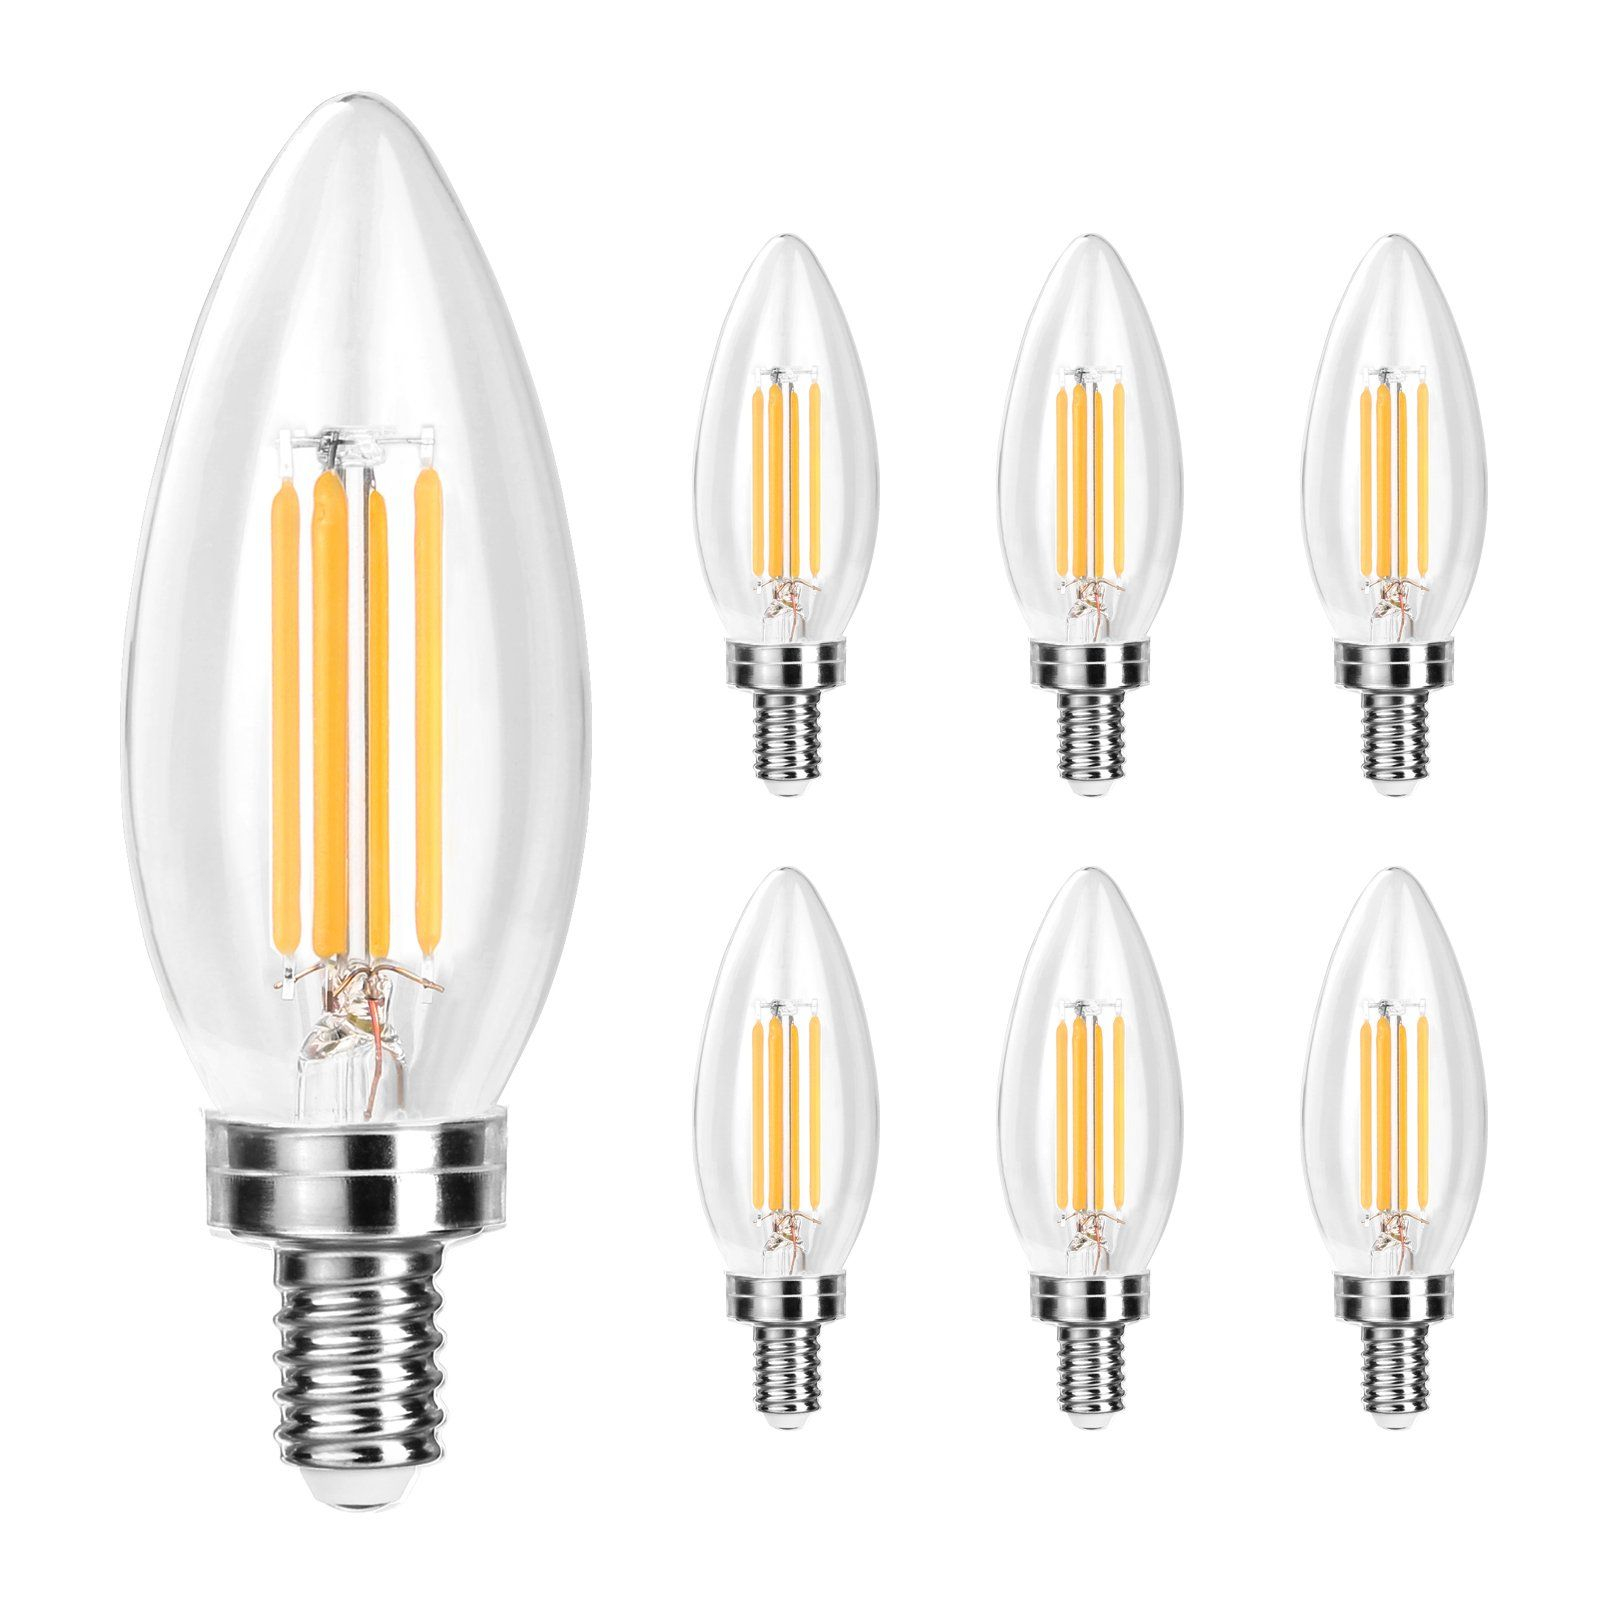 led candelabra bulbs 100w bulbs ideas. Black Bedroom Furniture Sets. Home Design Ideas